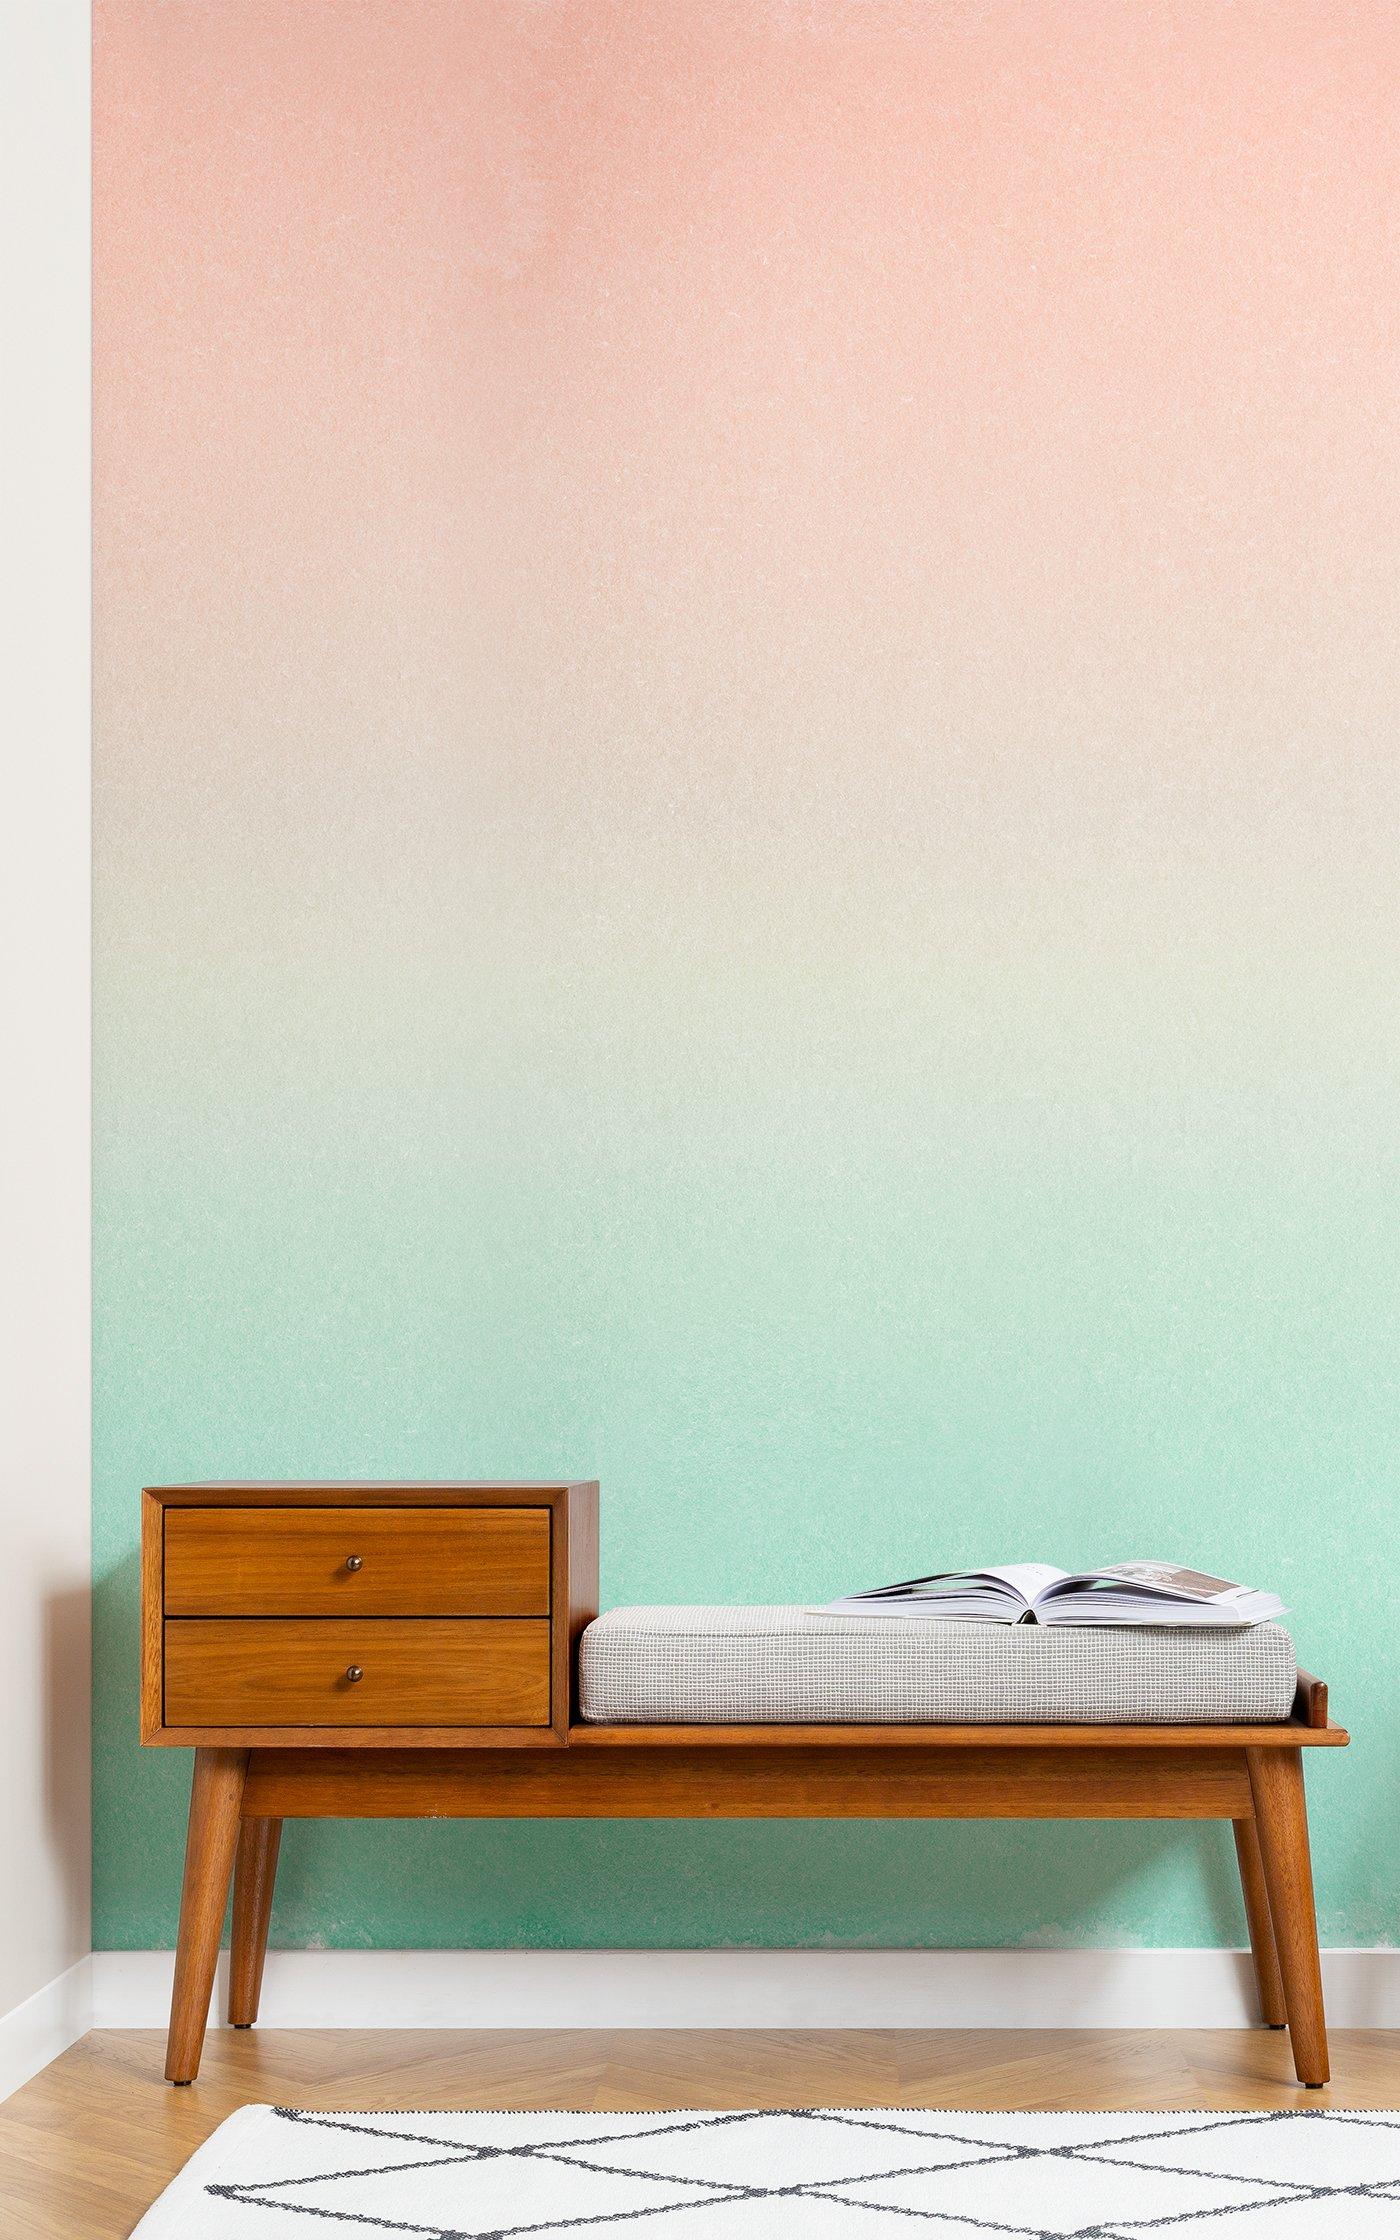 peach and green ombre fade wallpaper